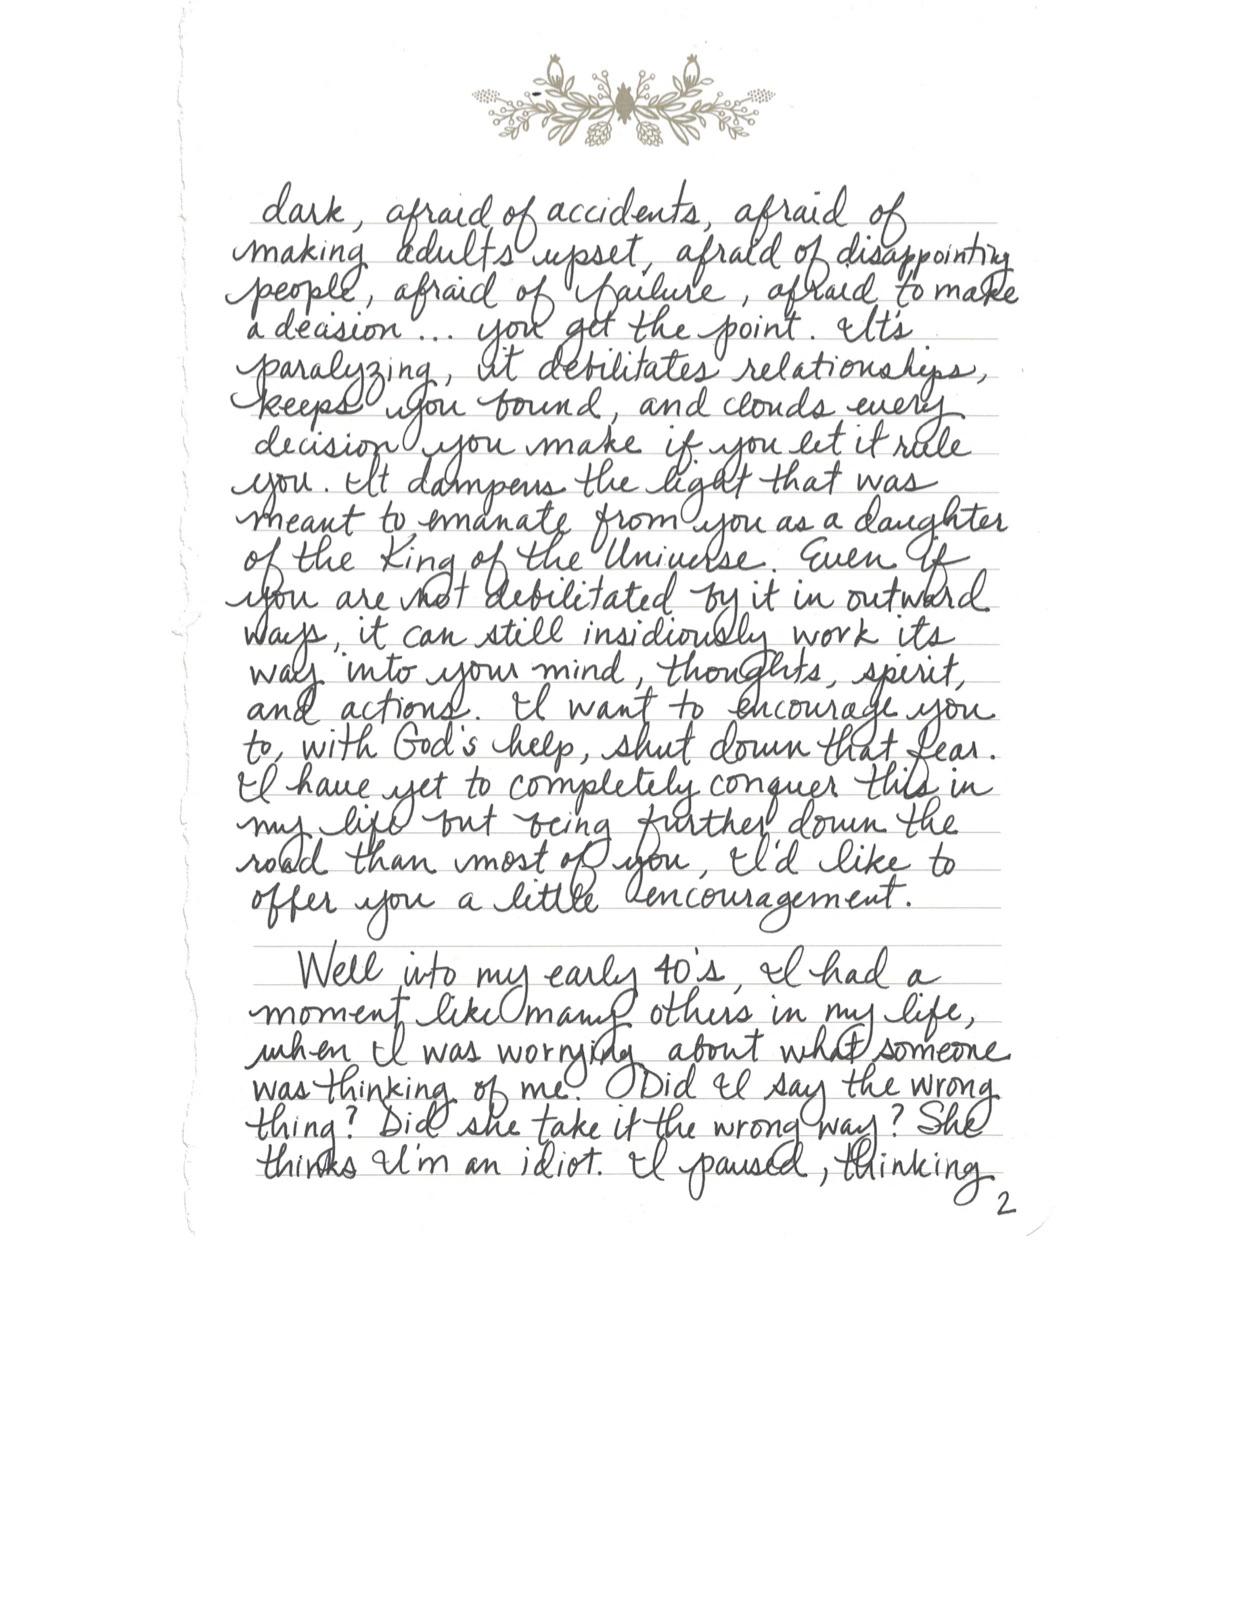 DeAnn_Malcolm_Handwritten2.jpg